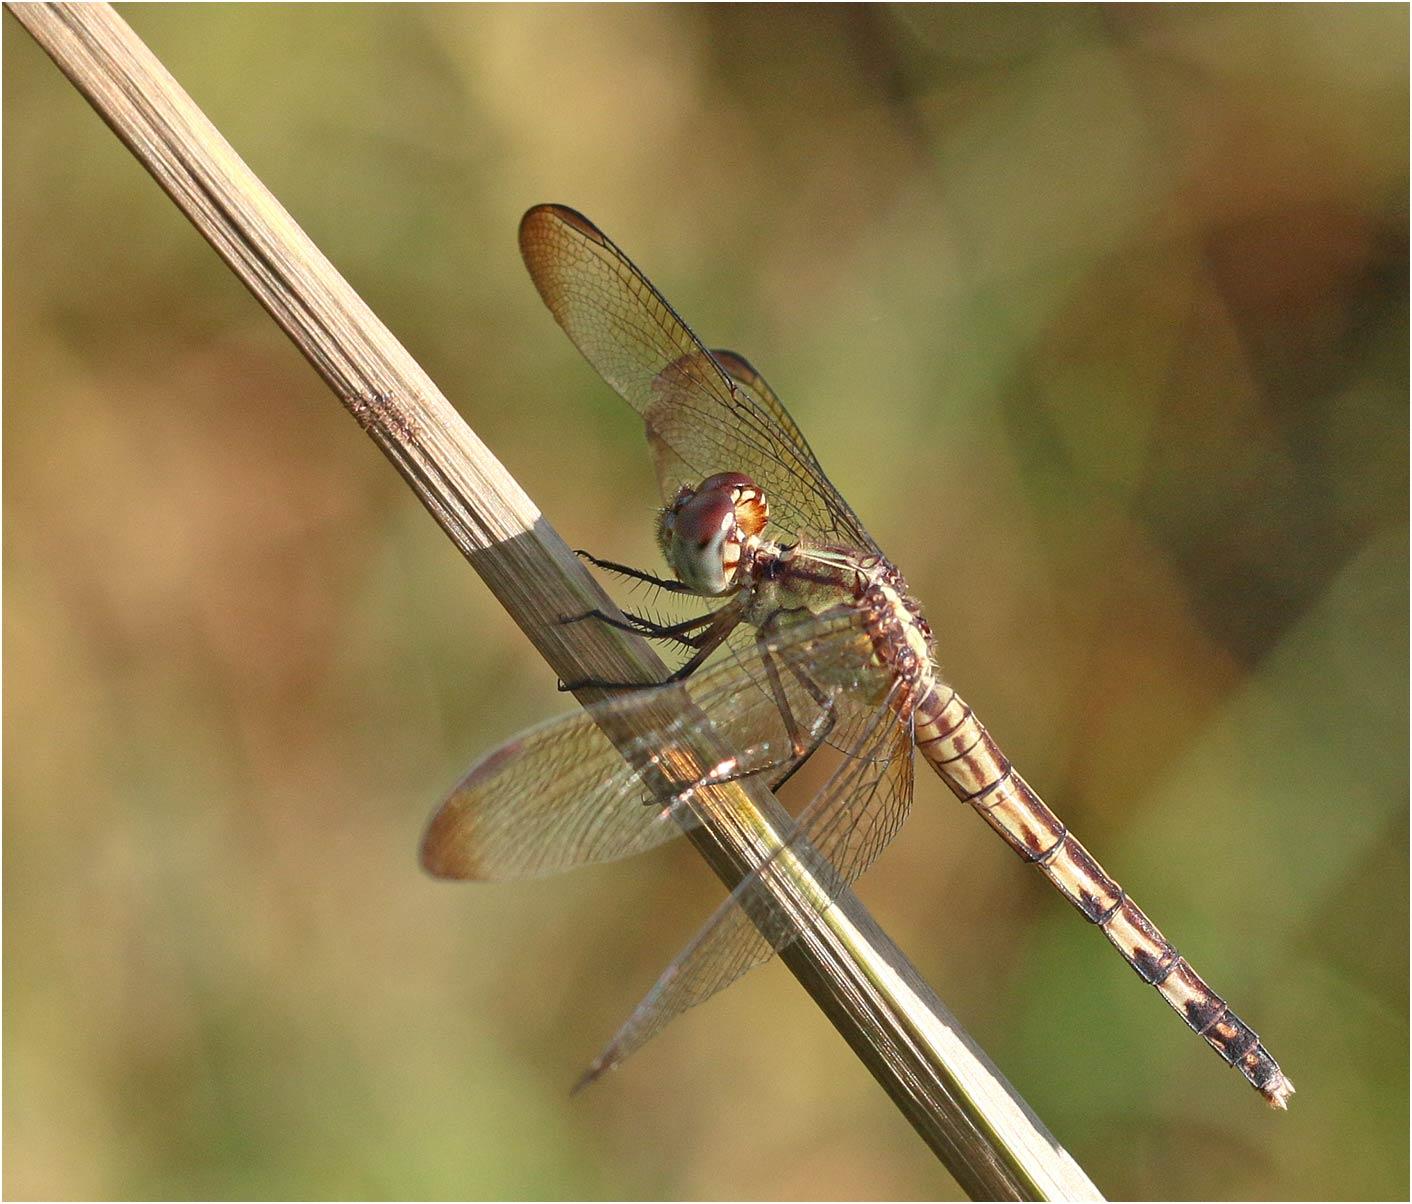 Erythrodiplax umbrata femelle, Mexique, Palenque, 29/10/2019